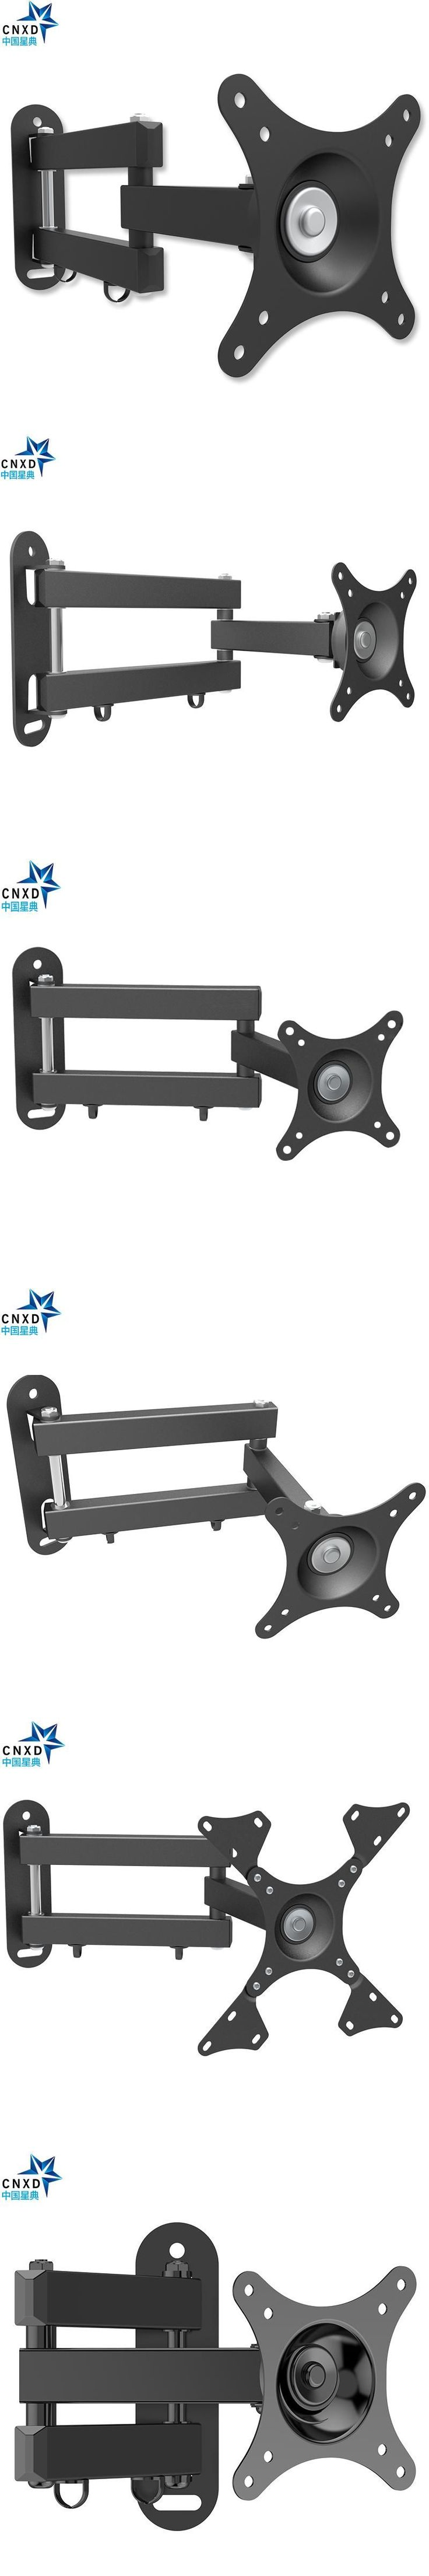 CNXD Universal LCD LED TV PC Monitor Wall Mount Bracket Tilt Swivel Plasma TV Wall Mount VESA 200*200mm